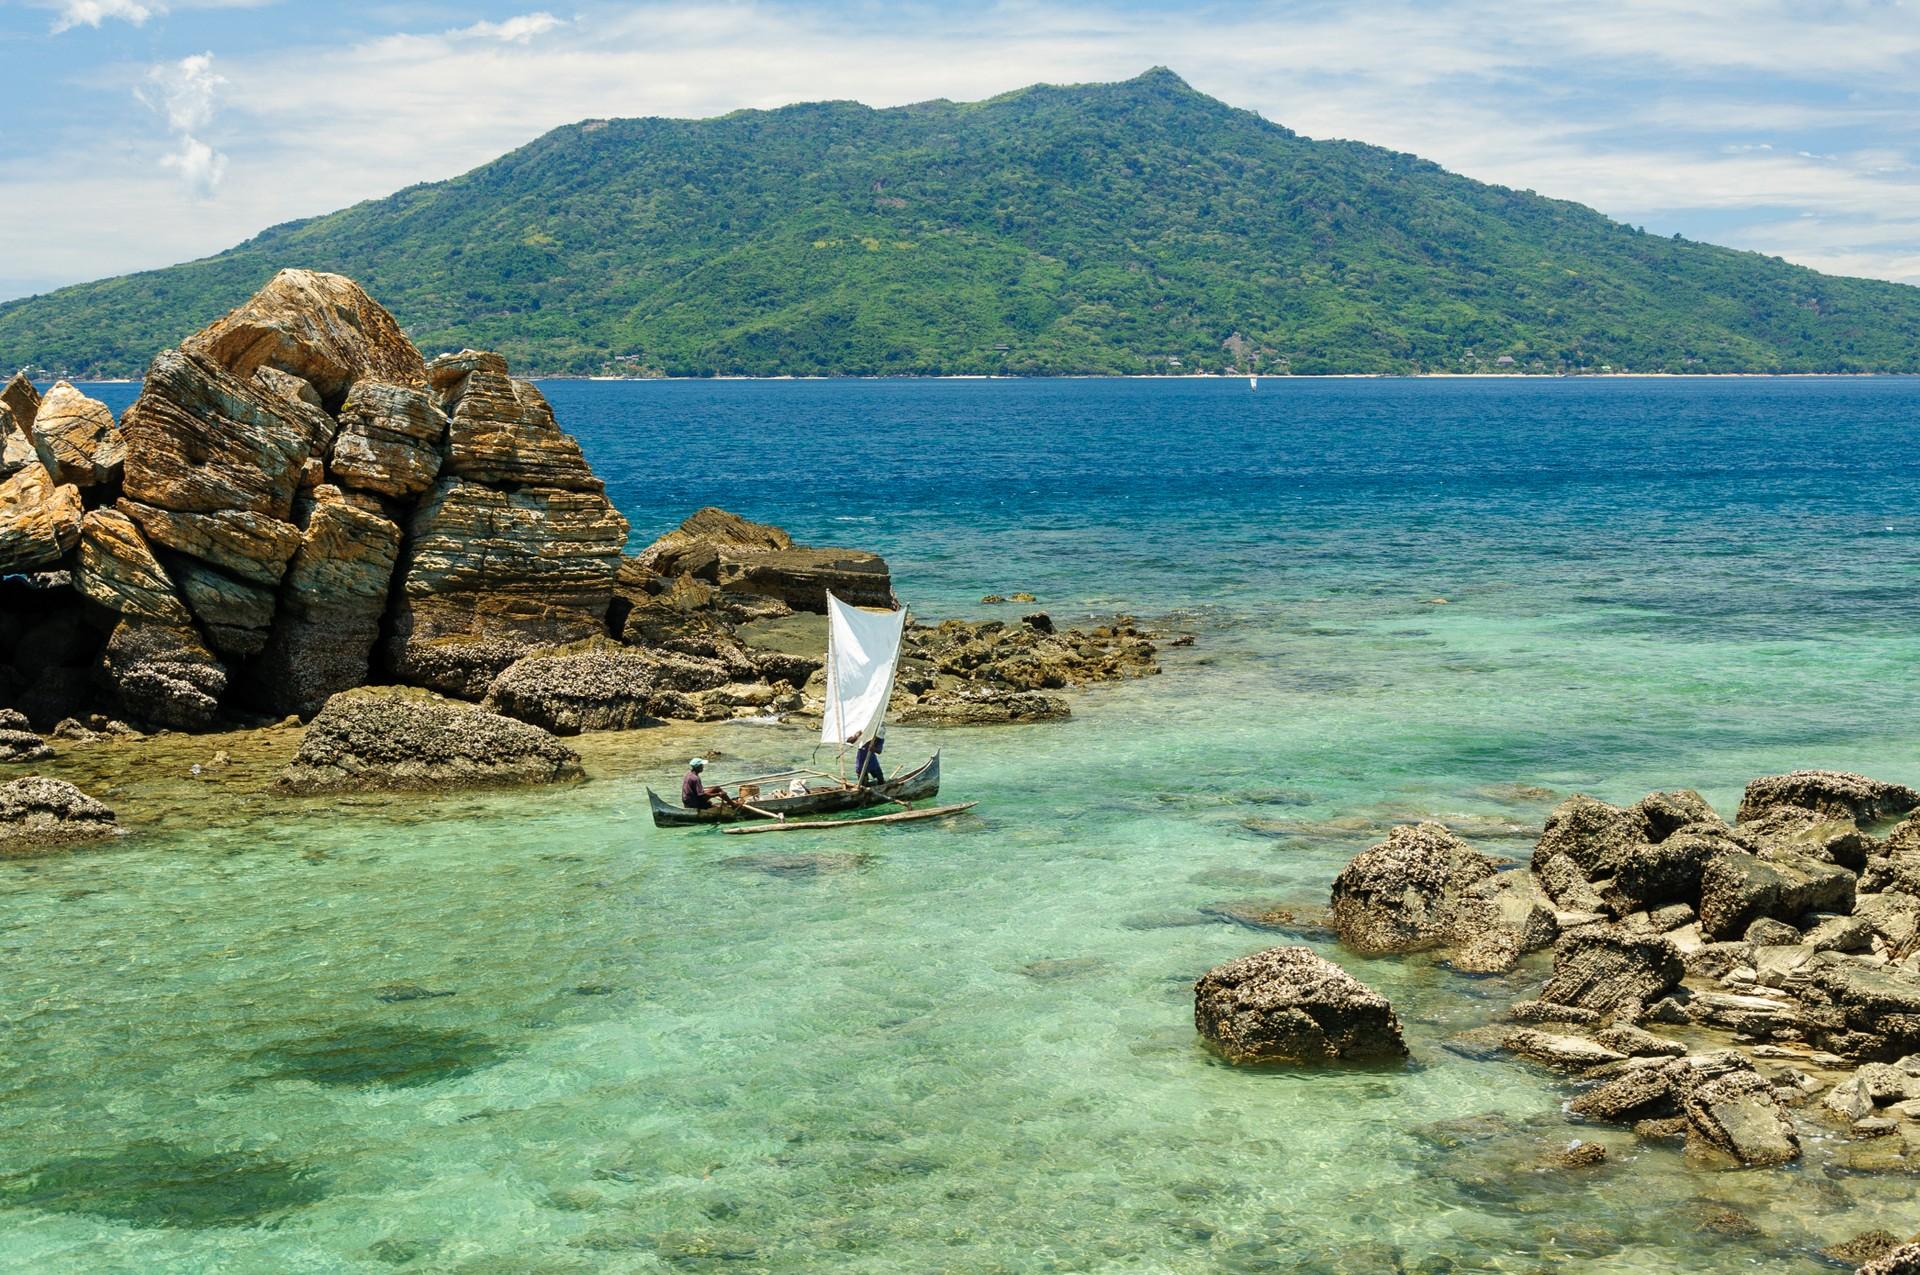 pirogue off coast of Ile Sainte Marie, Madagascar